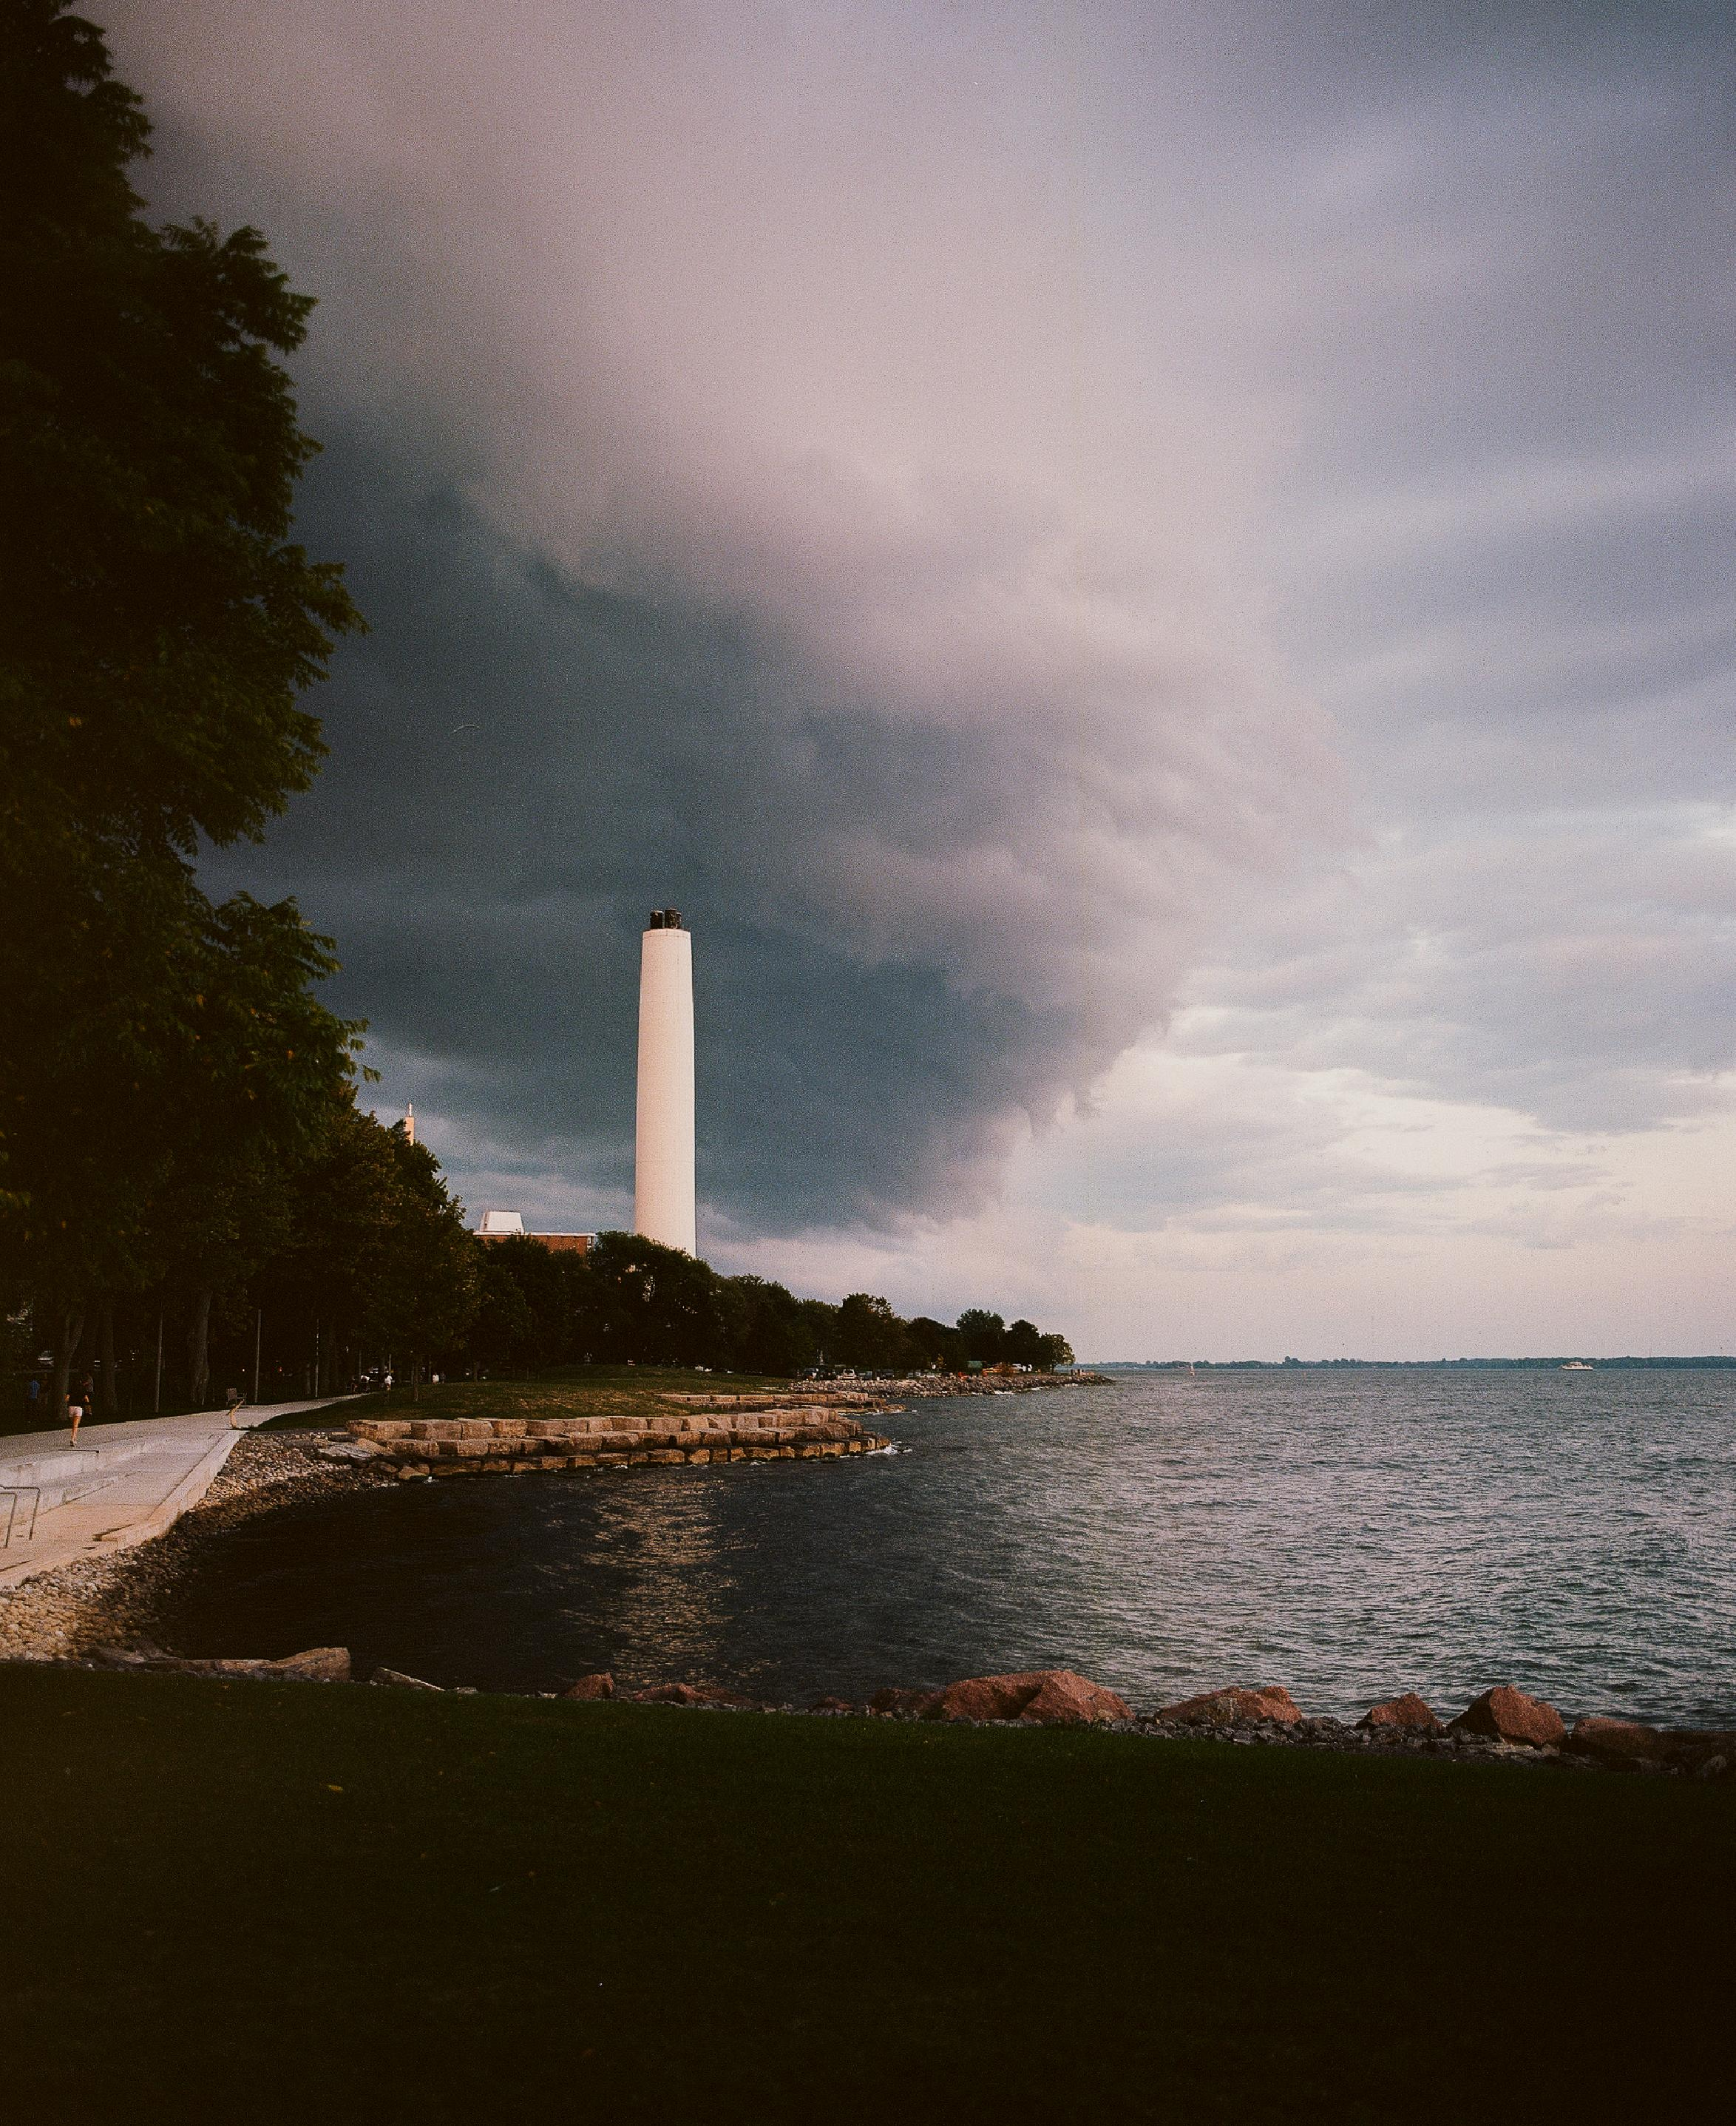 Storm Cloud Overhead